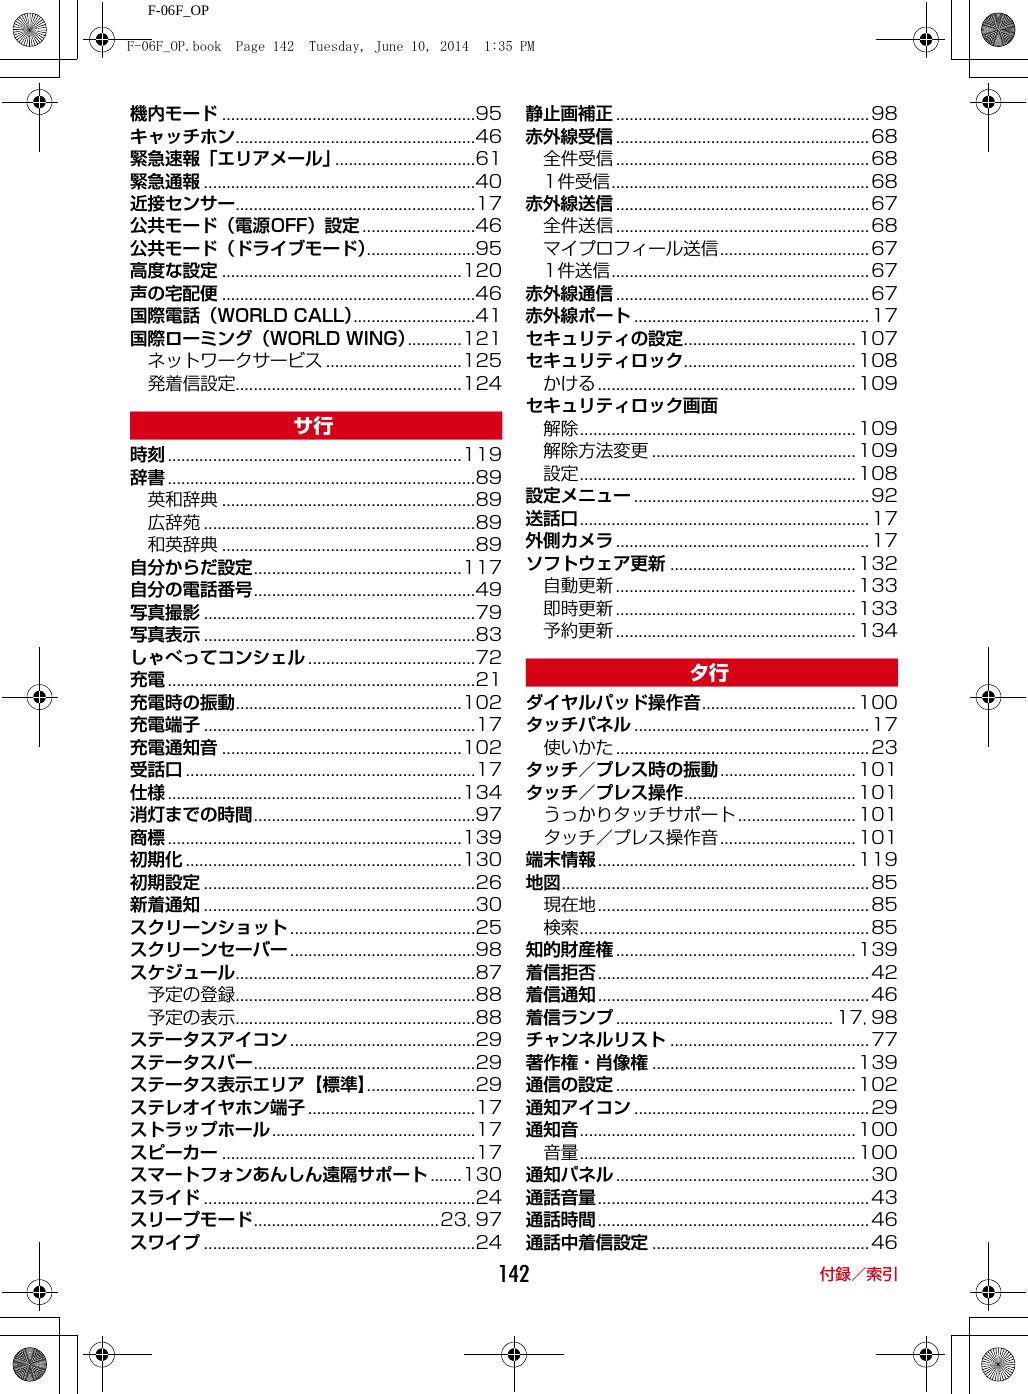 Fujitsu F06F Smart Phone User Manual 3 rev